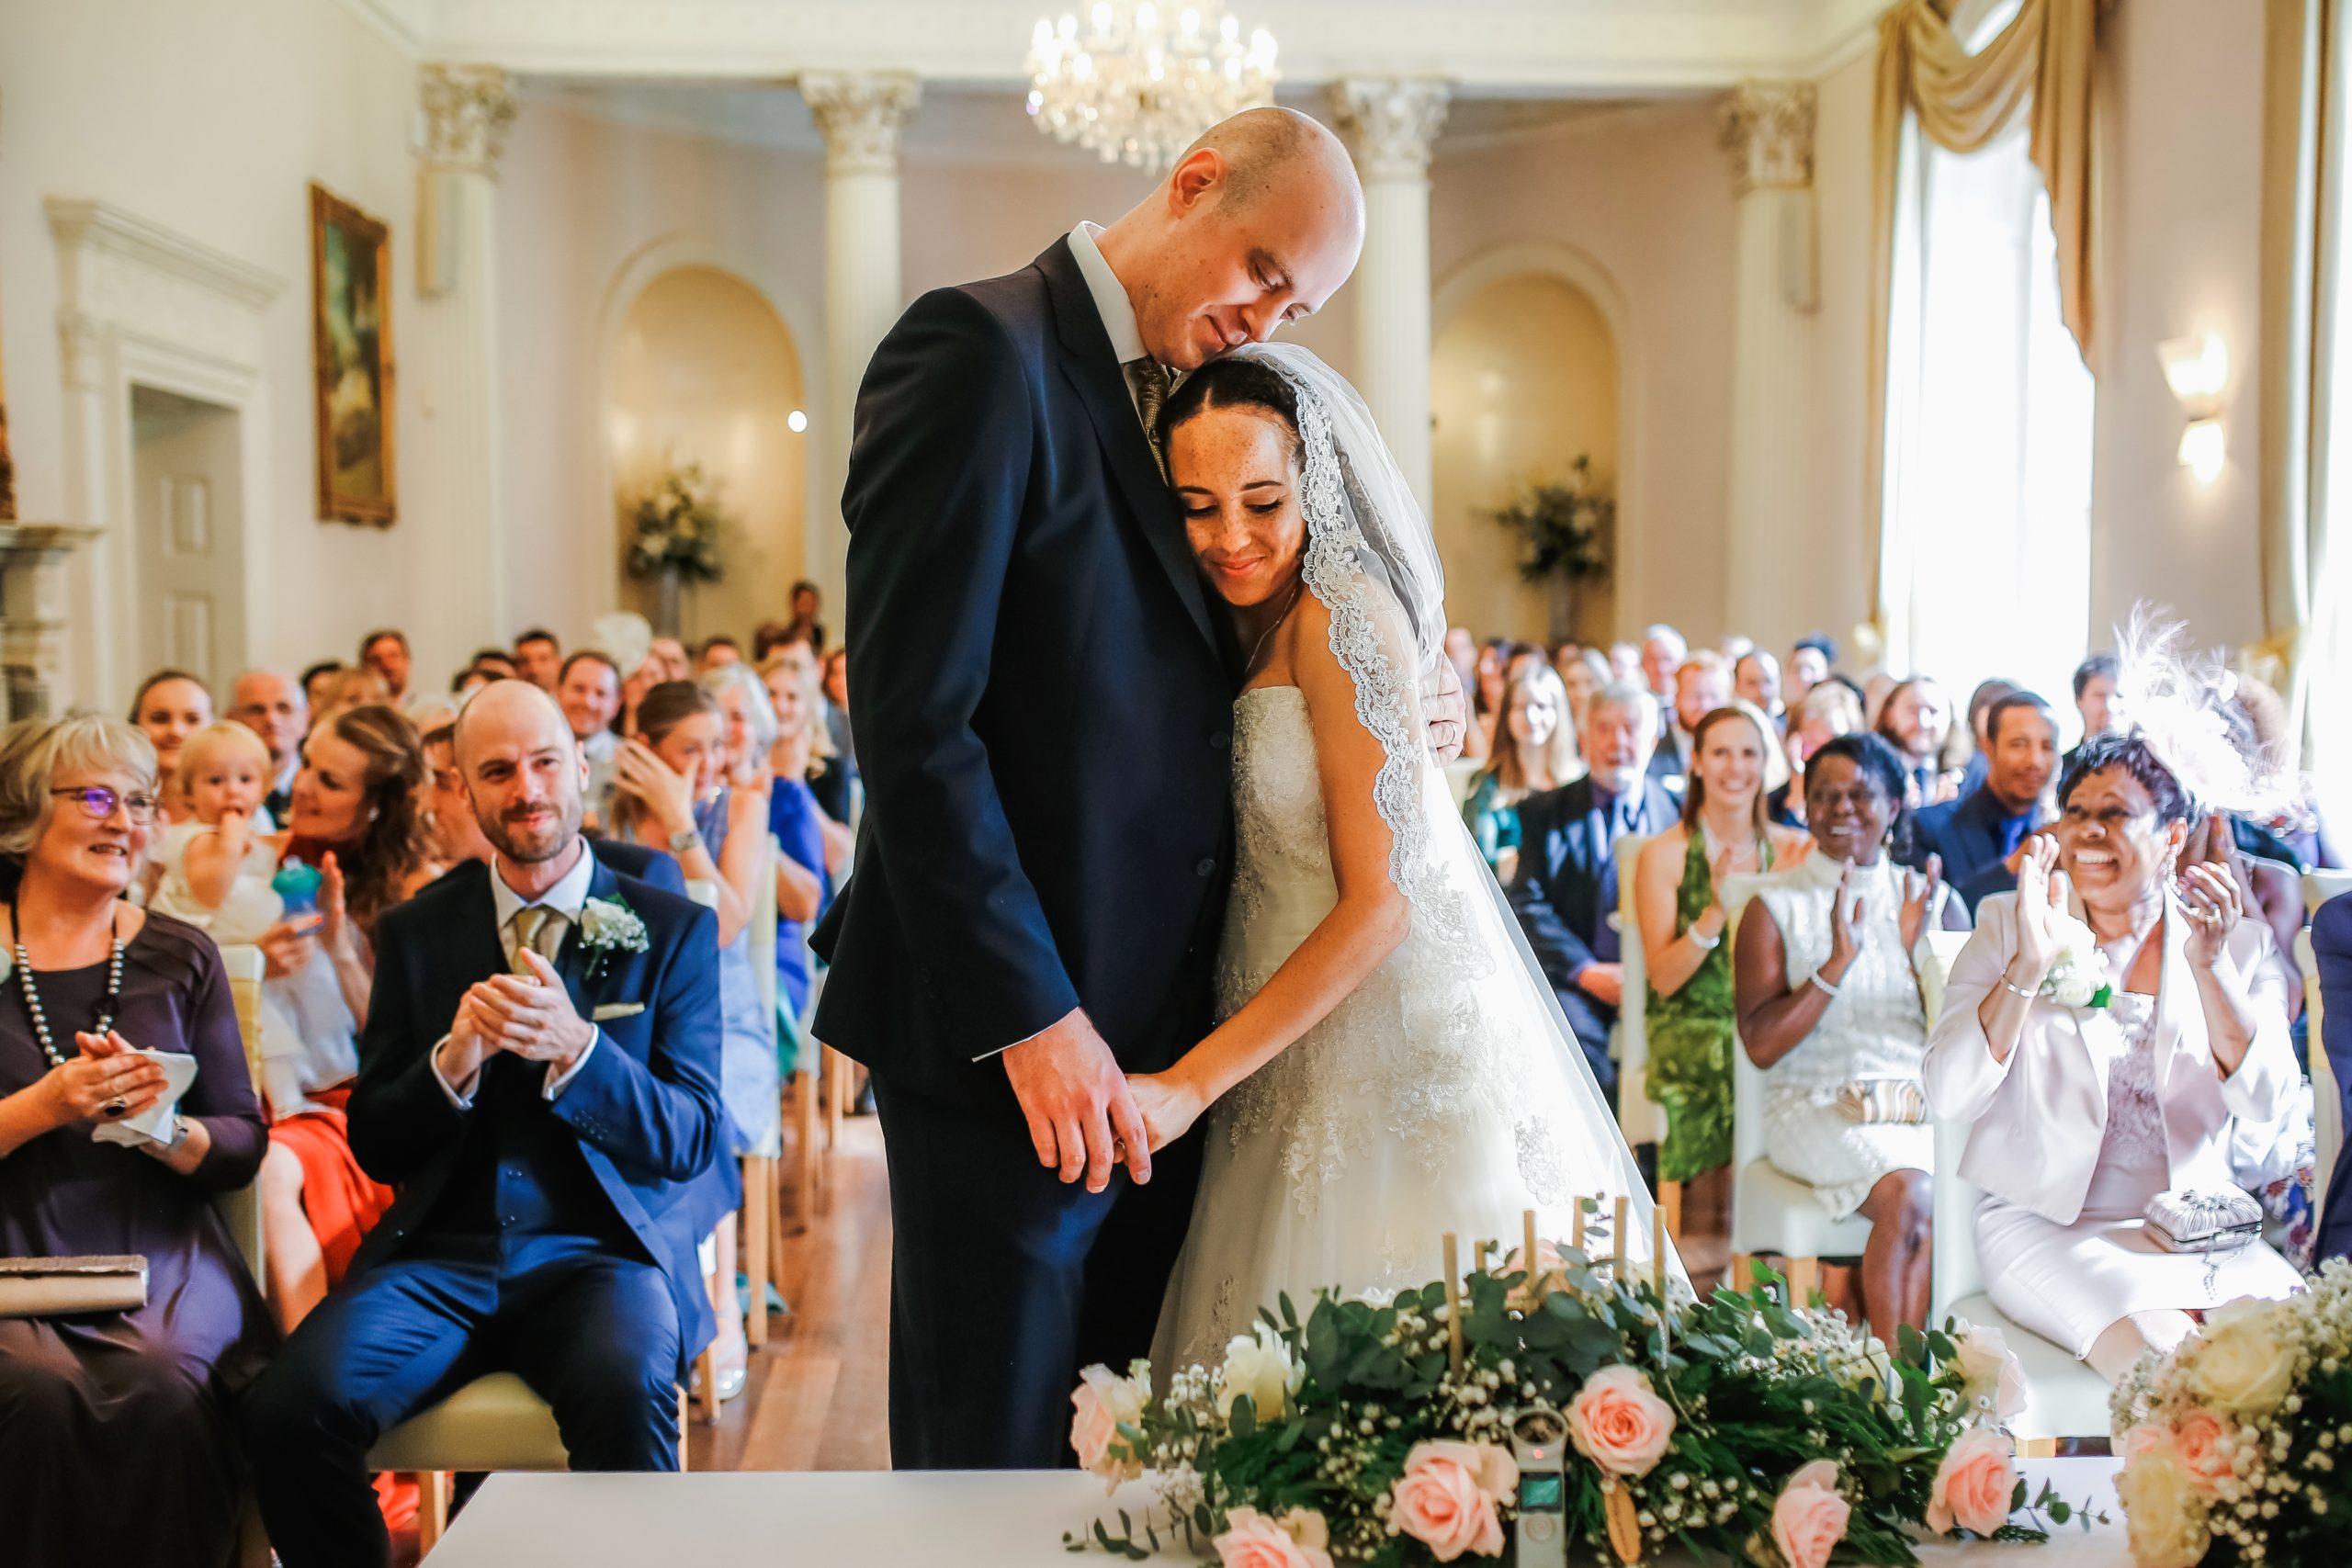 COLWICK HALL WEDDING – NOTTINGHAM